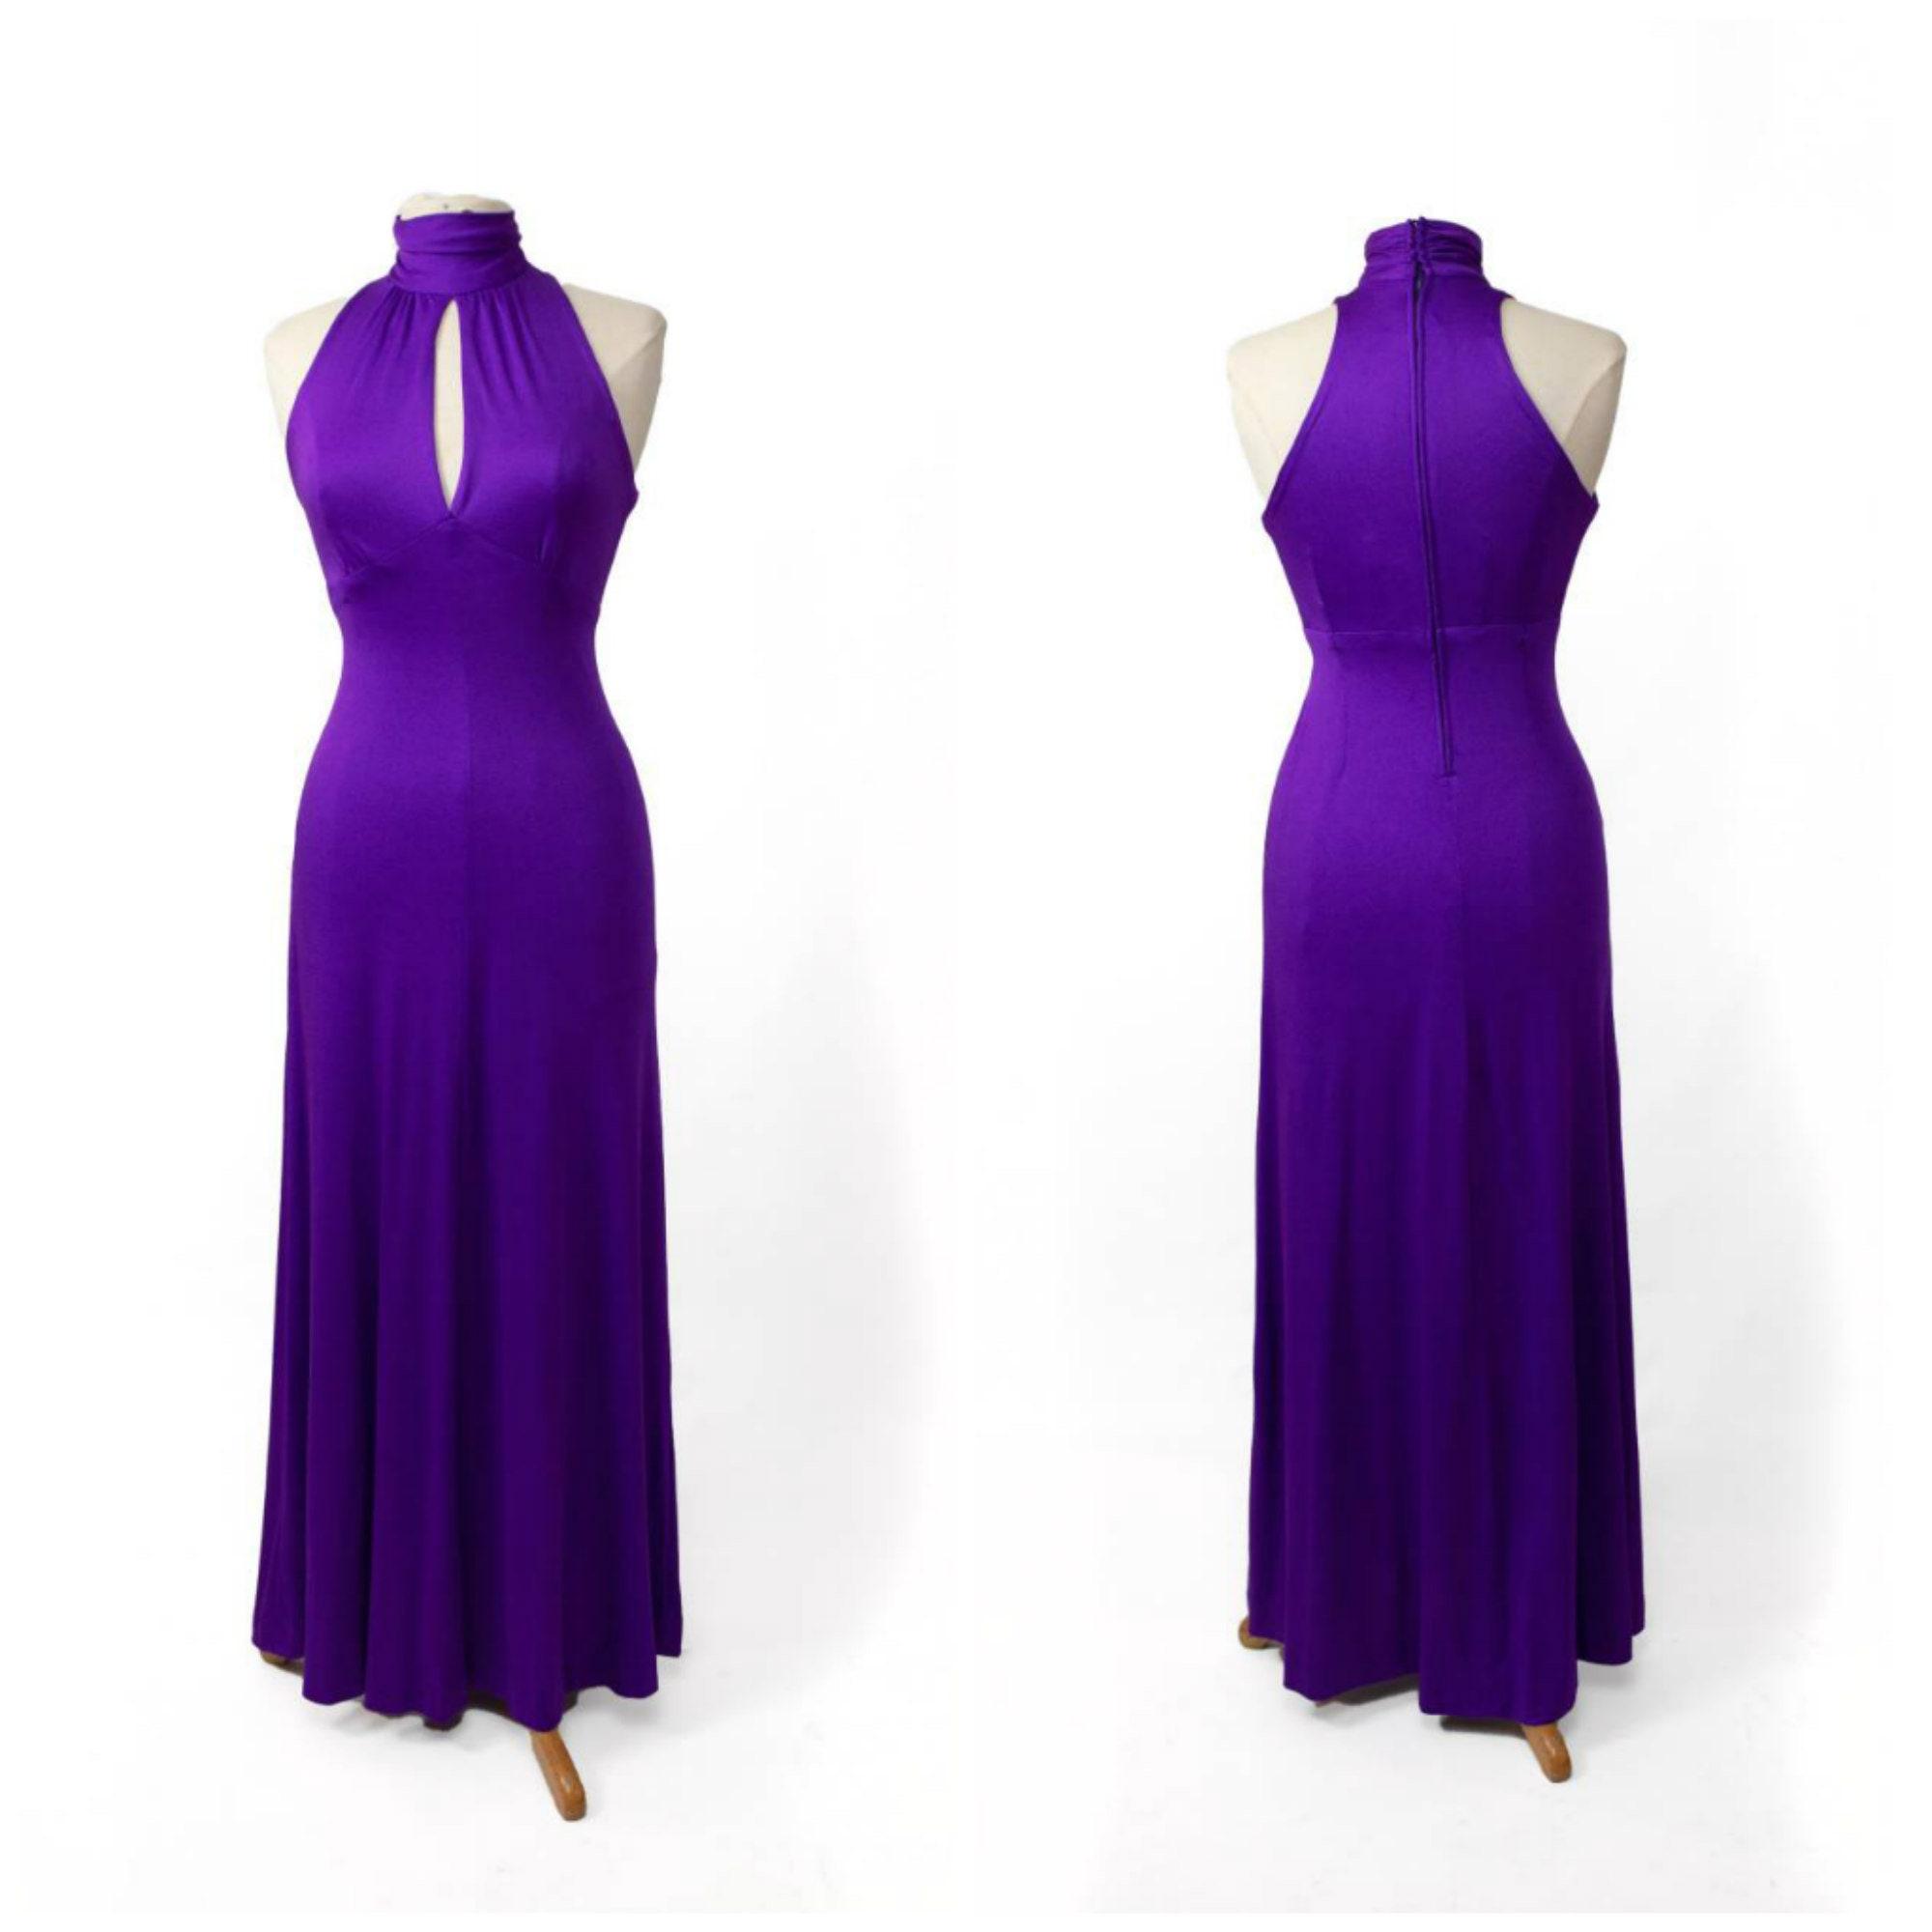 Vintage Scarf Styles -1920s to 1960s Dark Purple Sleeveless Racer Back Dress 70S Vintage Maxi $76.00 AT vintagedancer.com